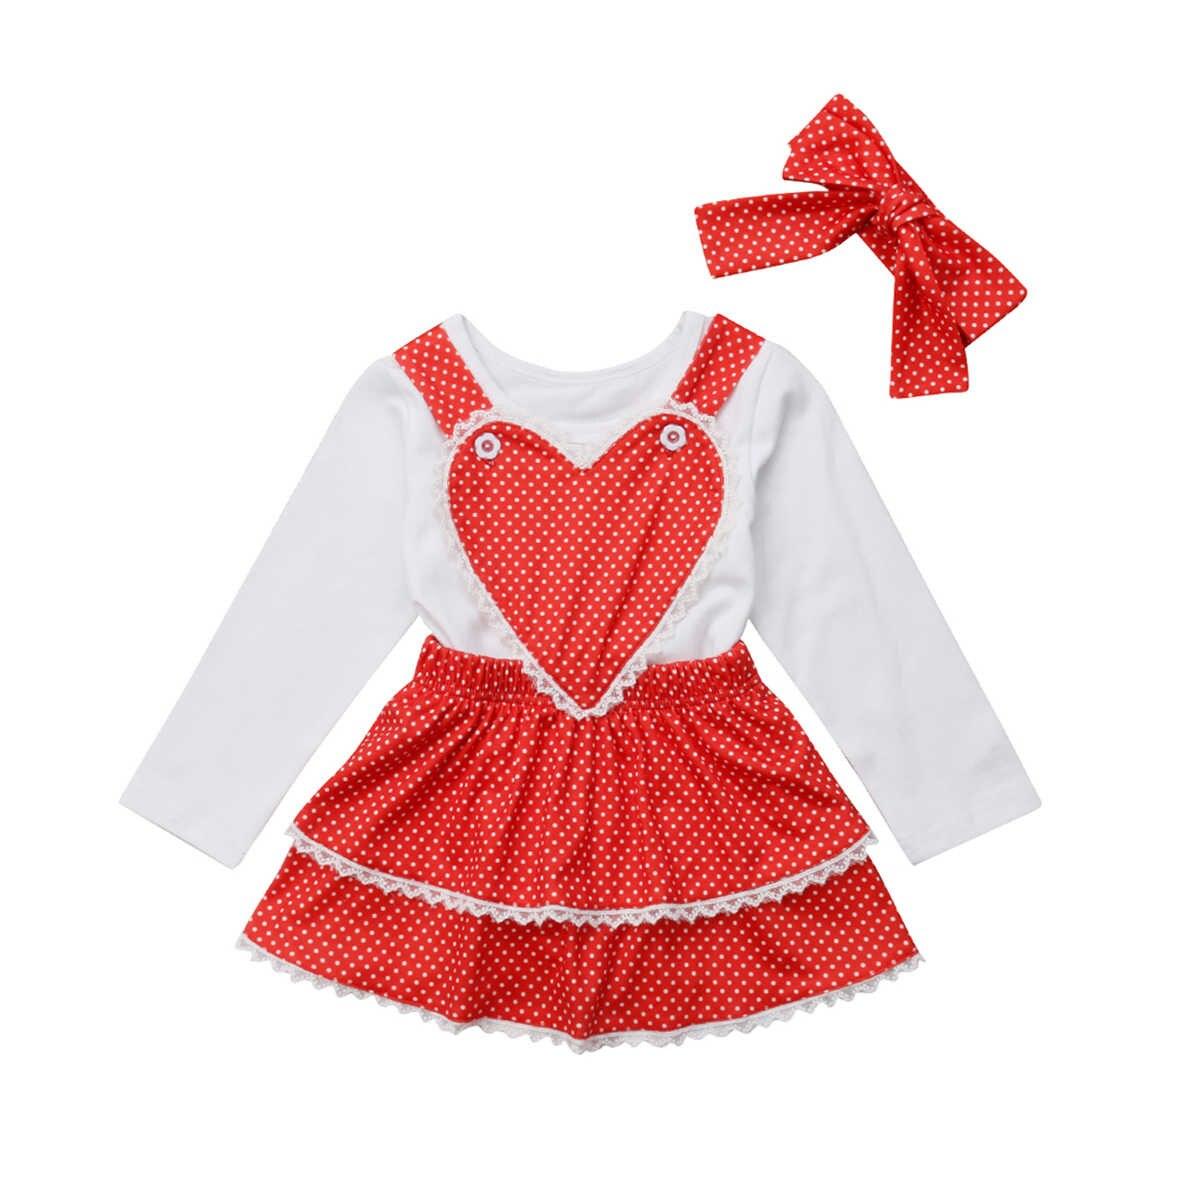 2b38f41bb25 3PCS Set Toddler Kids Baby Girl Clothes Long Sleeve Cotton T-shirt  White+Heart